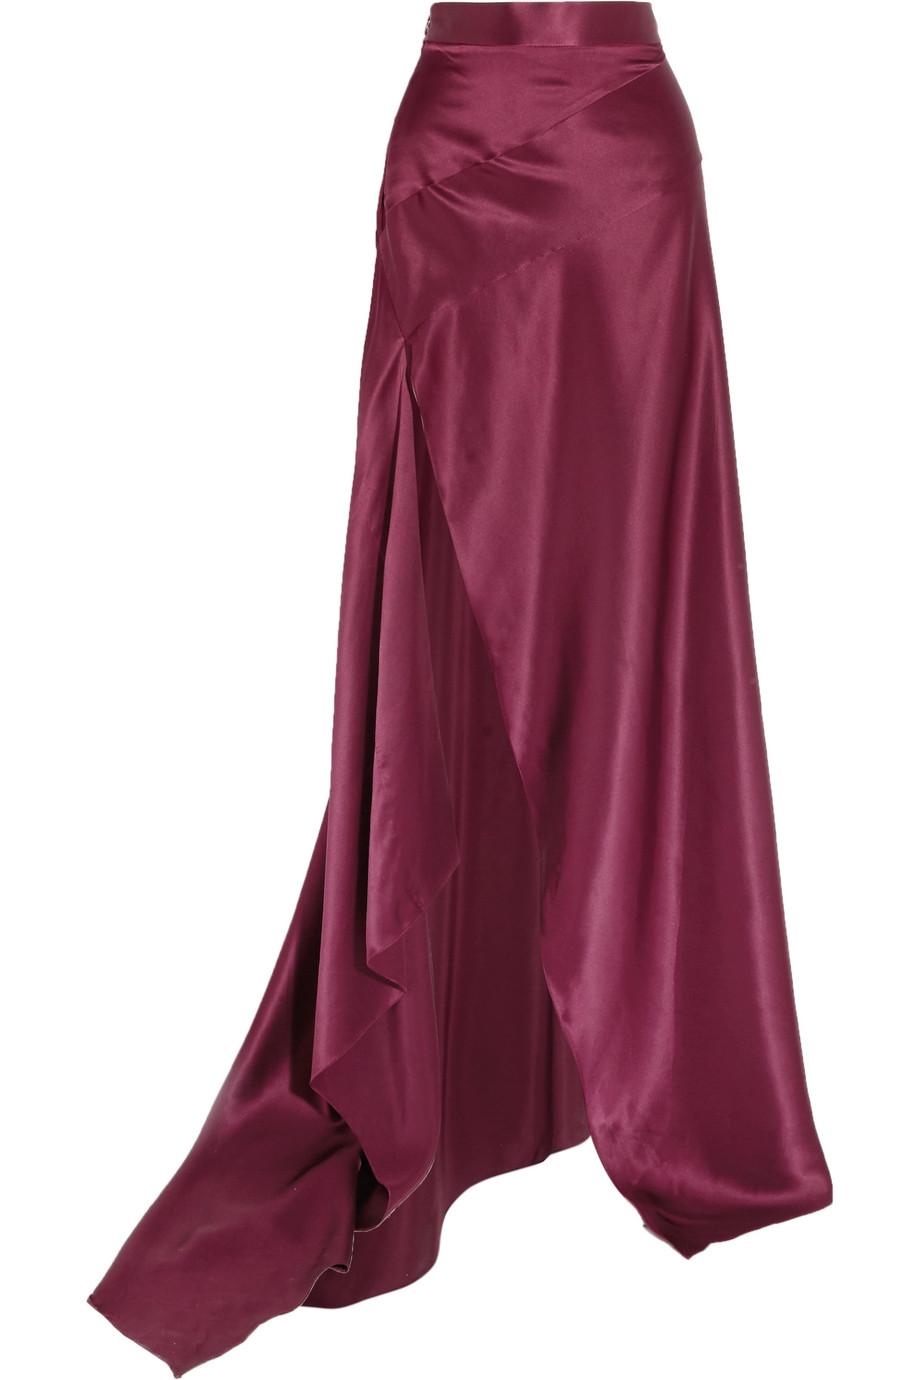 3961cb1508 Halfpenny London Georgie Pleated Satin Maxi Skirt Netaportercom | 2019  trends | xoosha